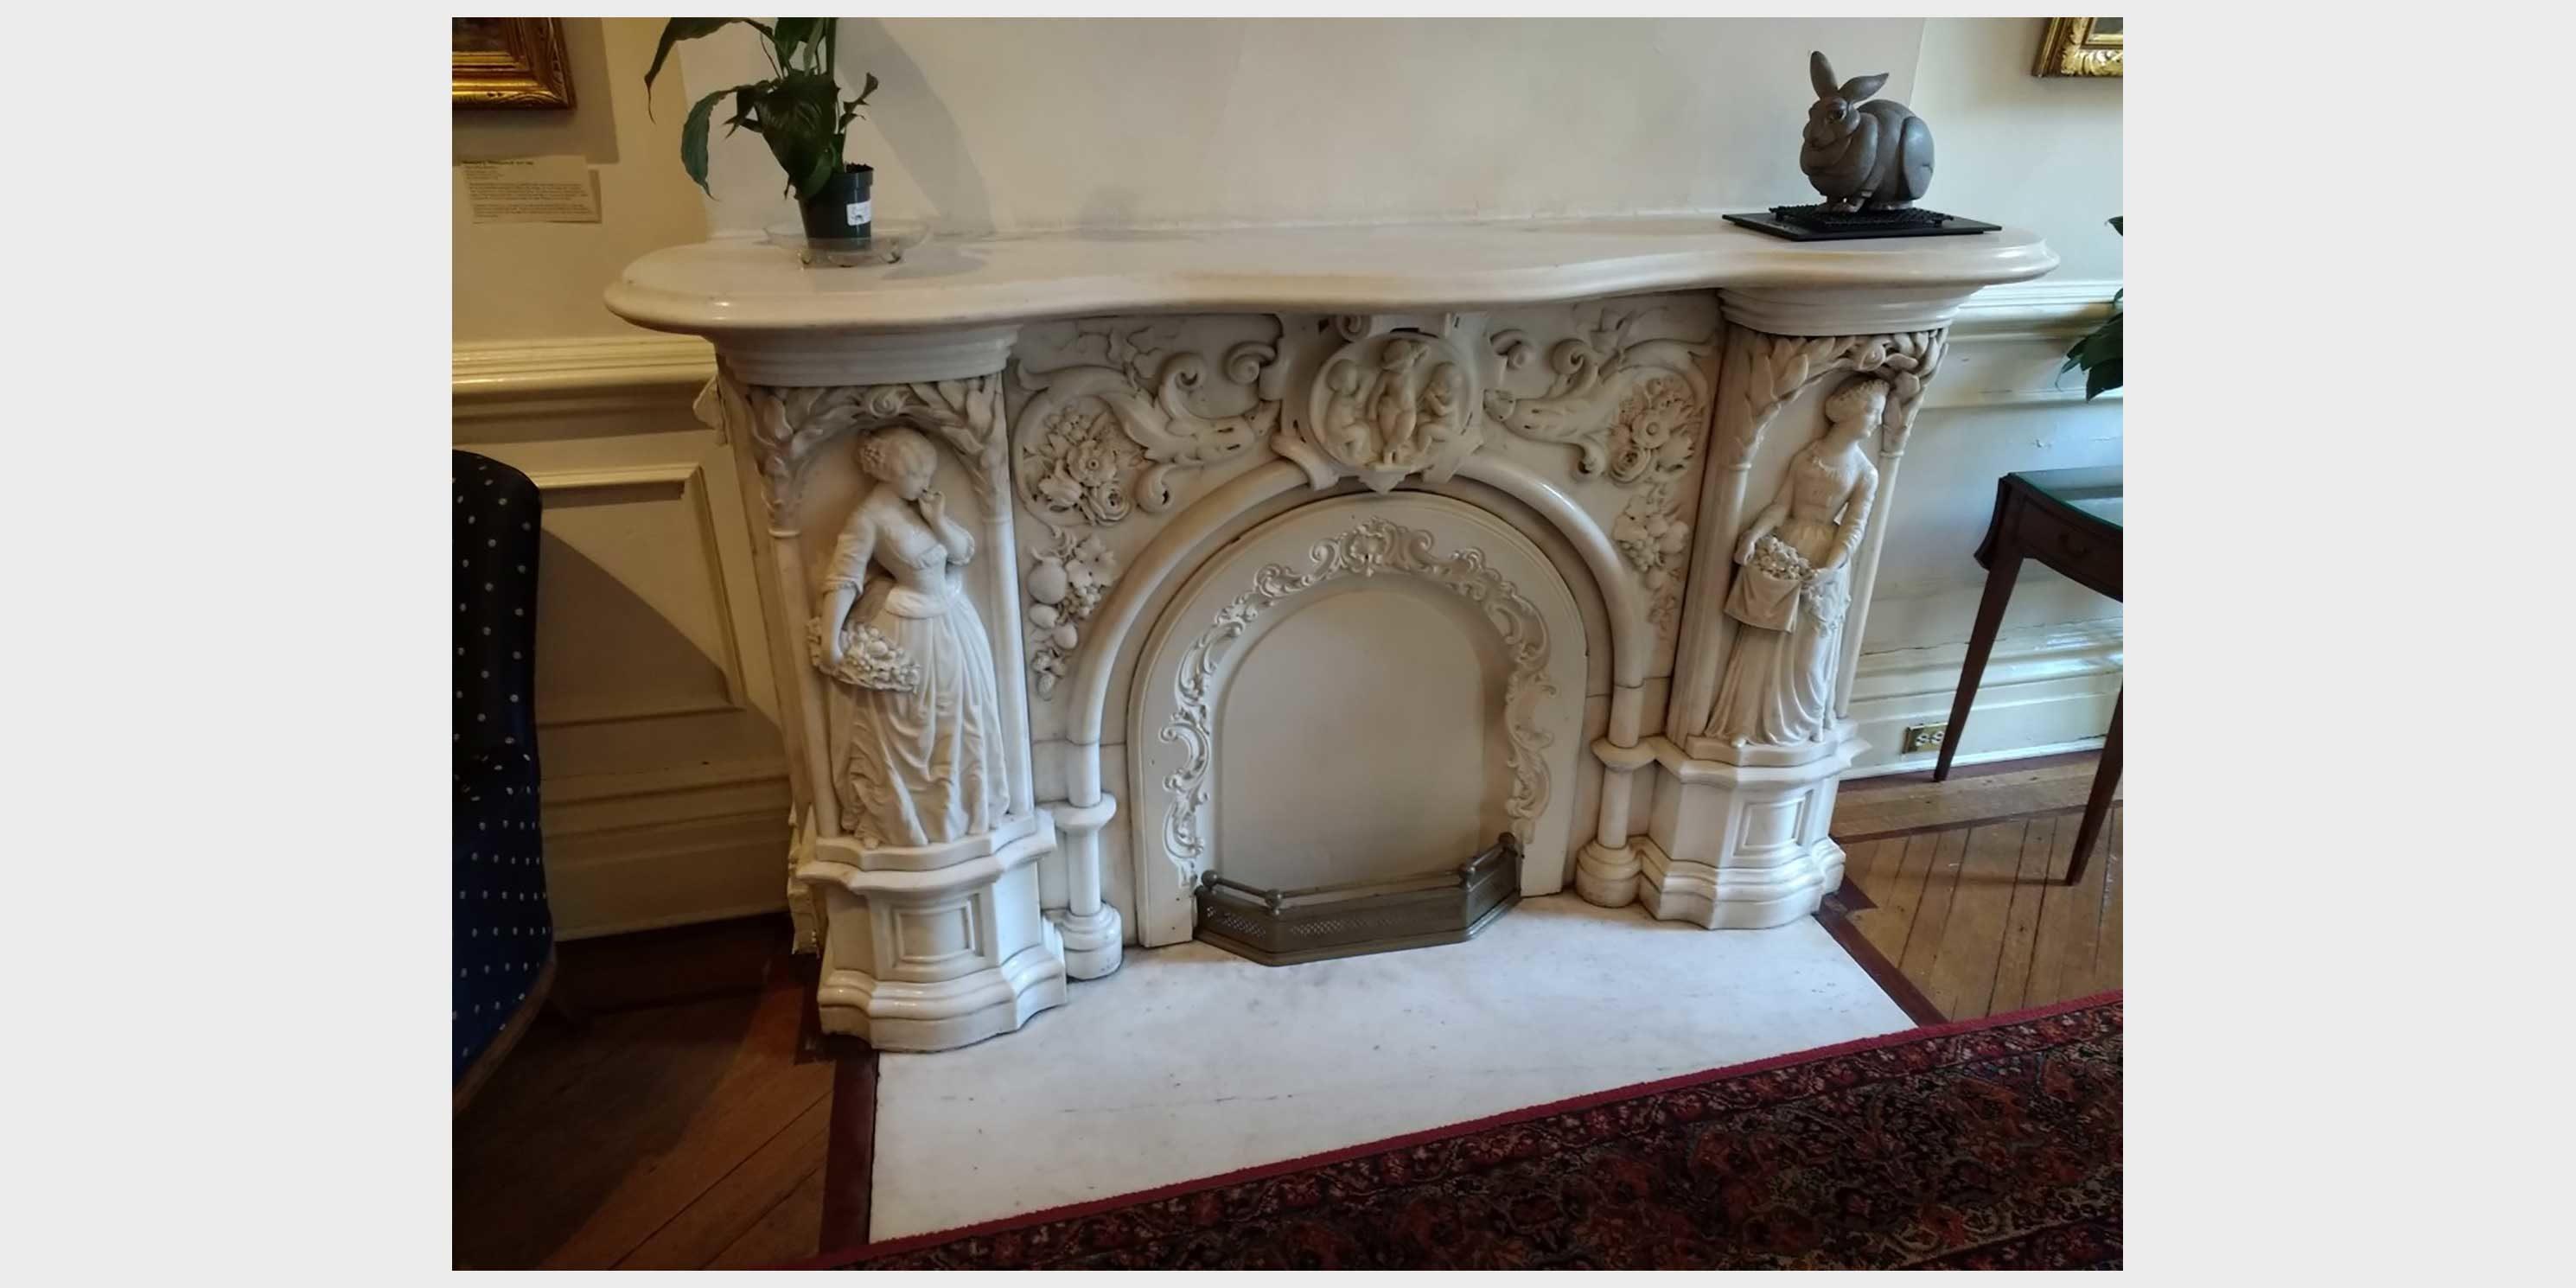 ornate marble fireplace at the Salamagundi Club